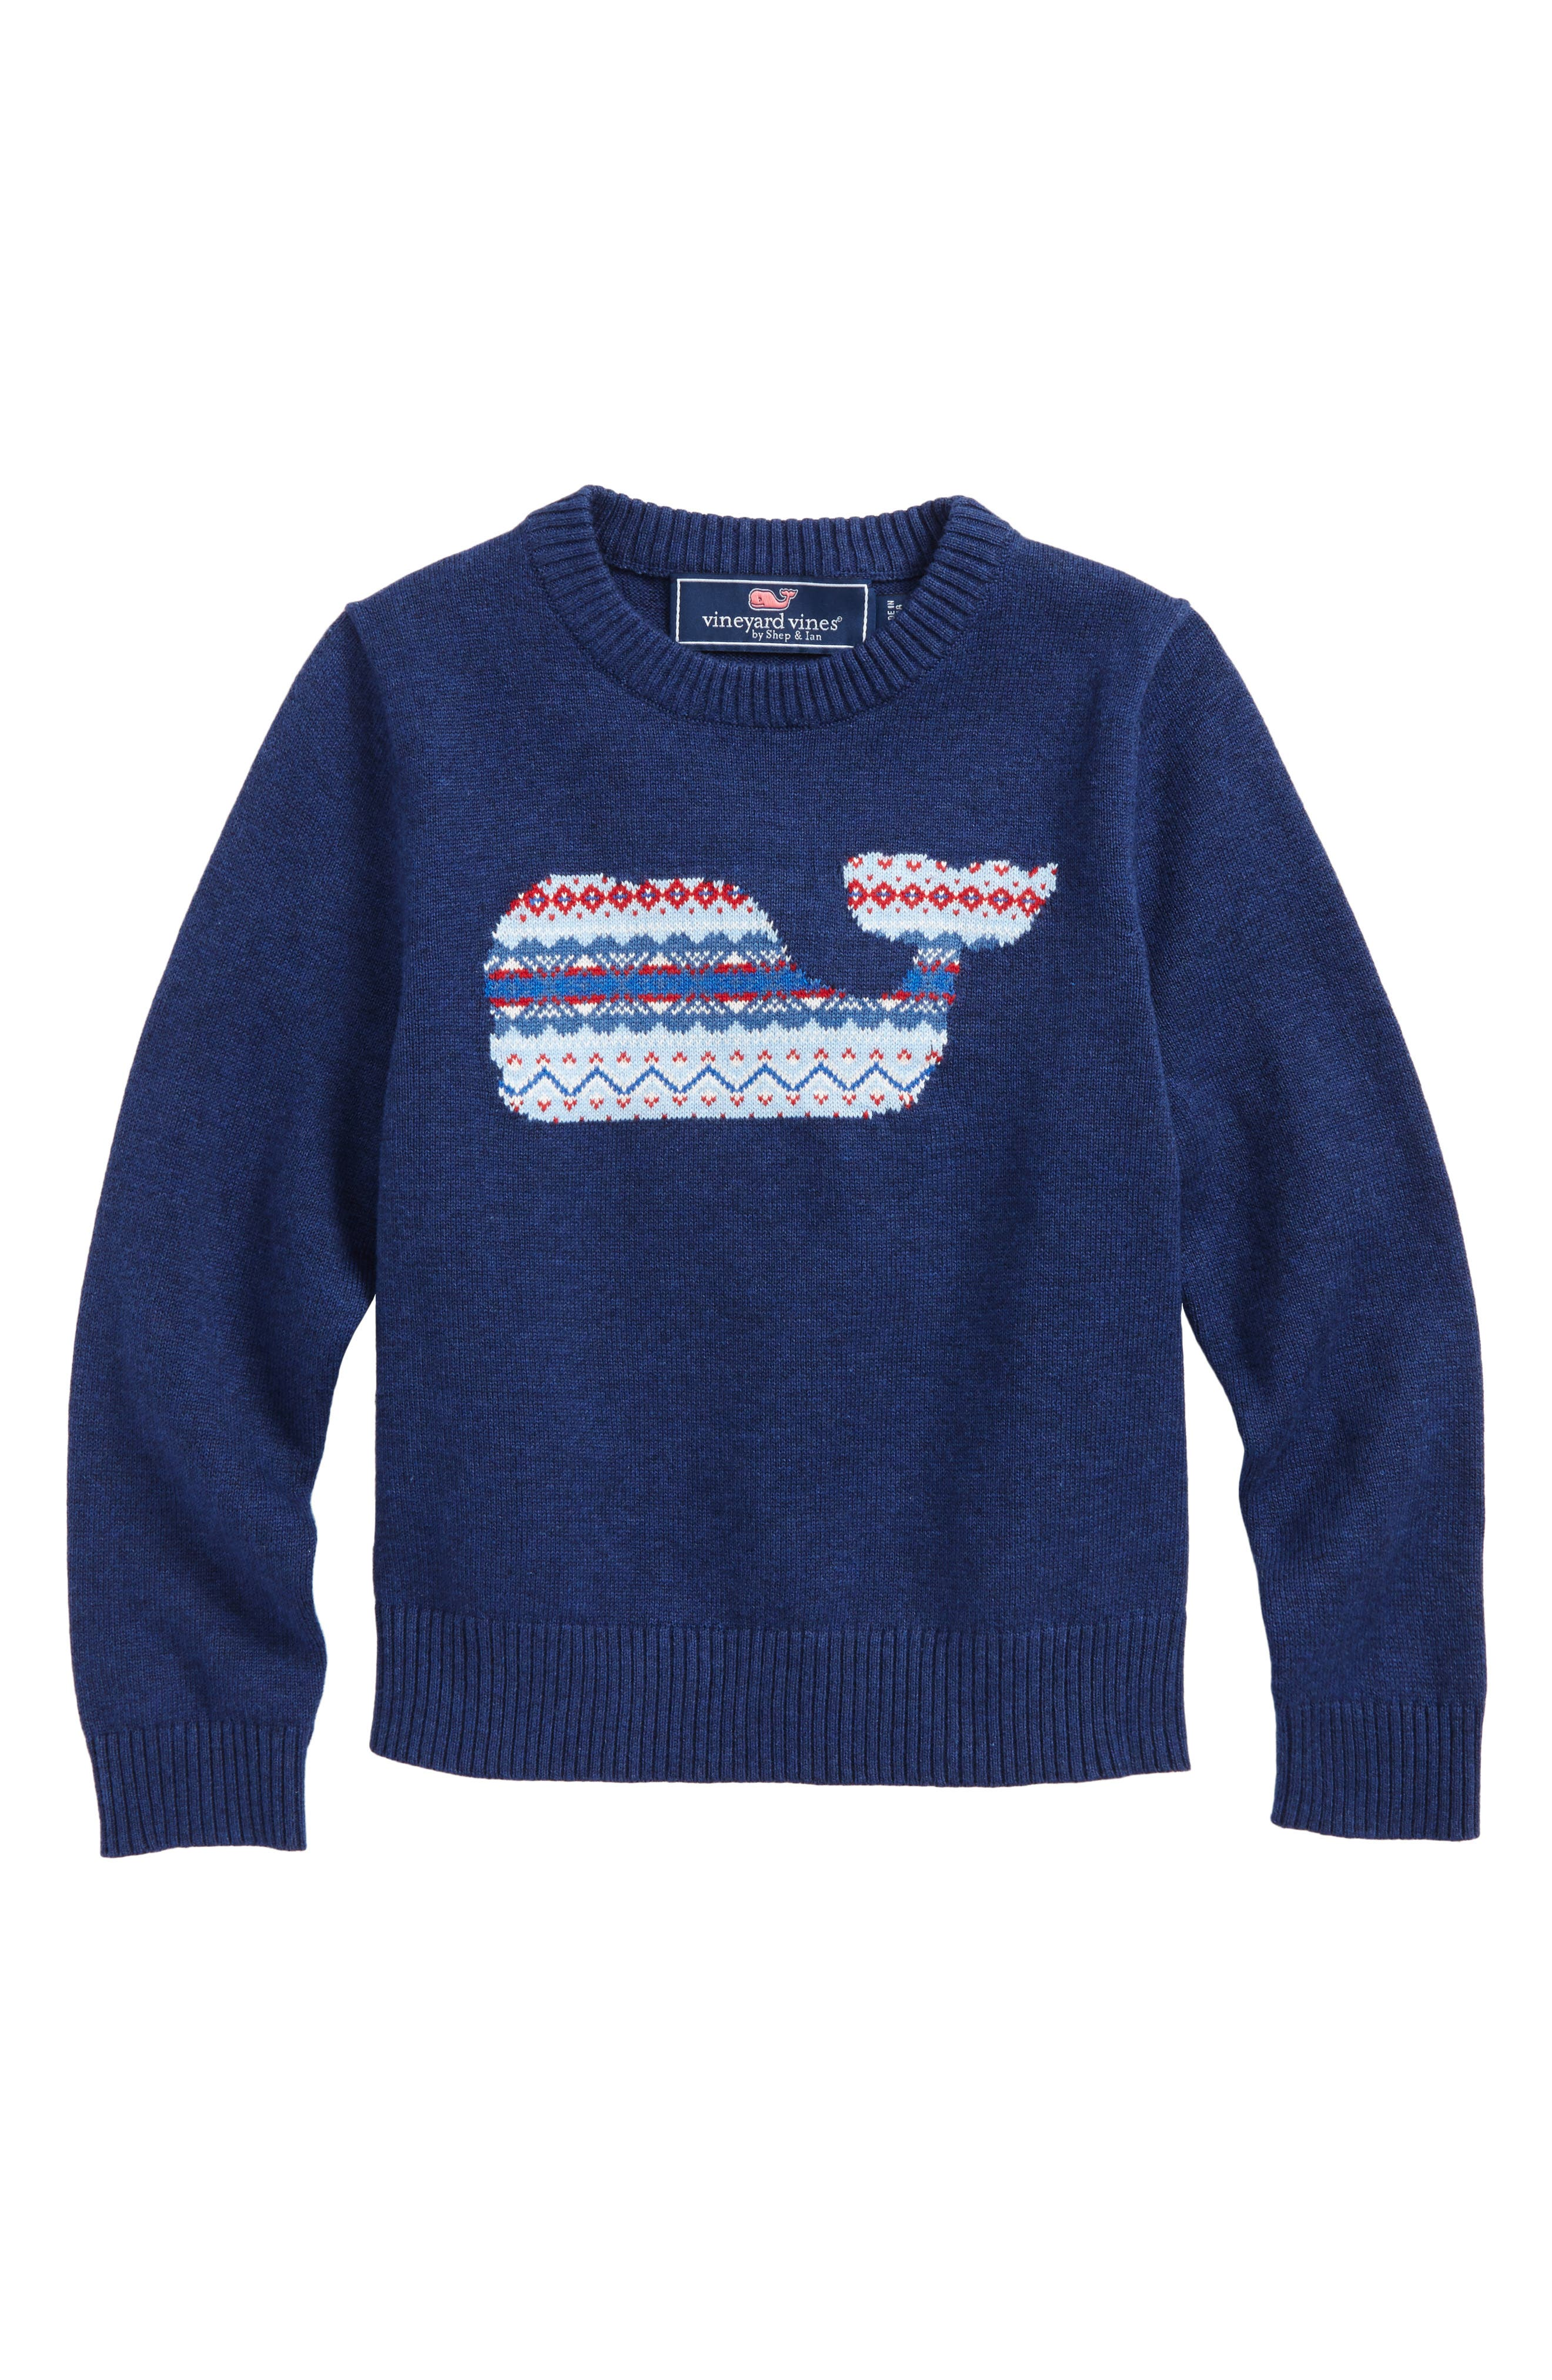 vineyard vines Whale Isle Intarsia Sweater (Toddler Boys & Little Boys)